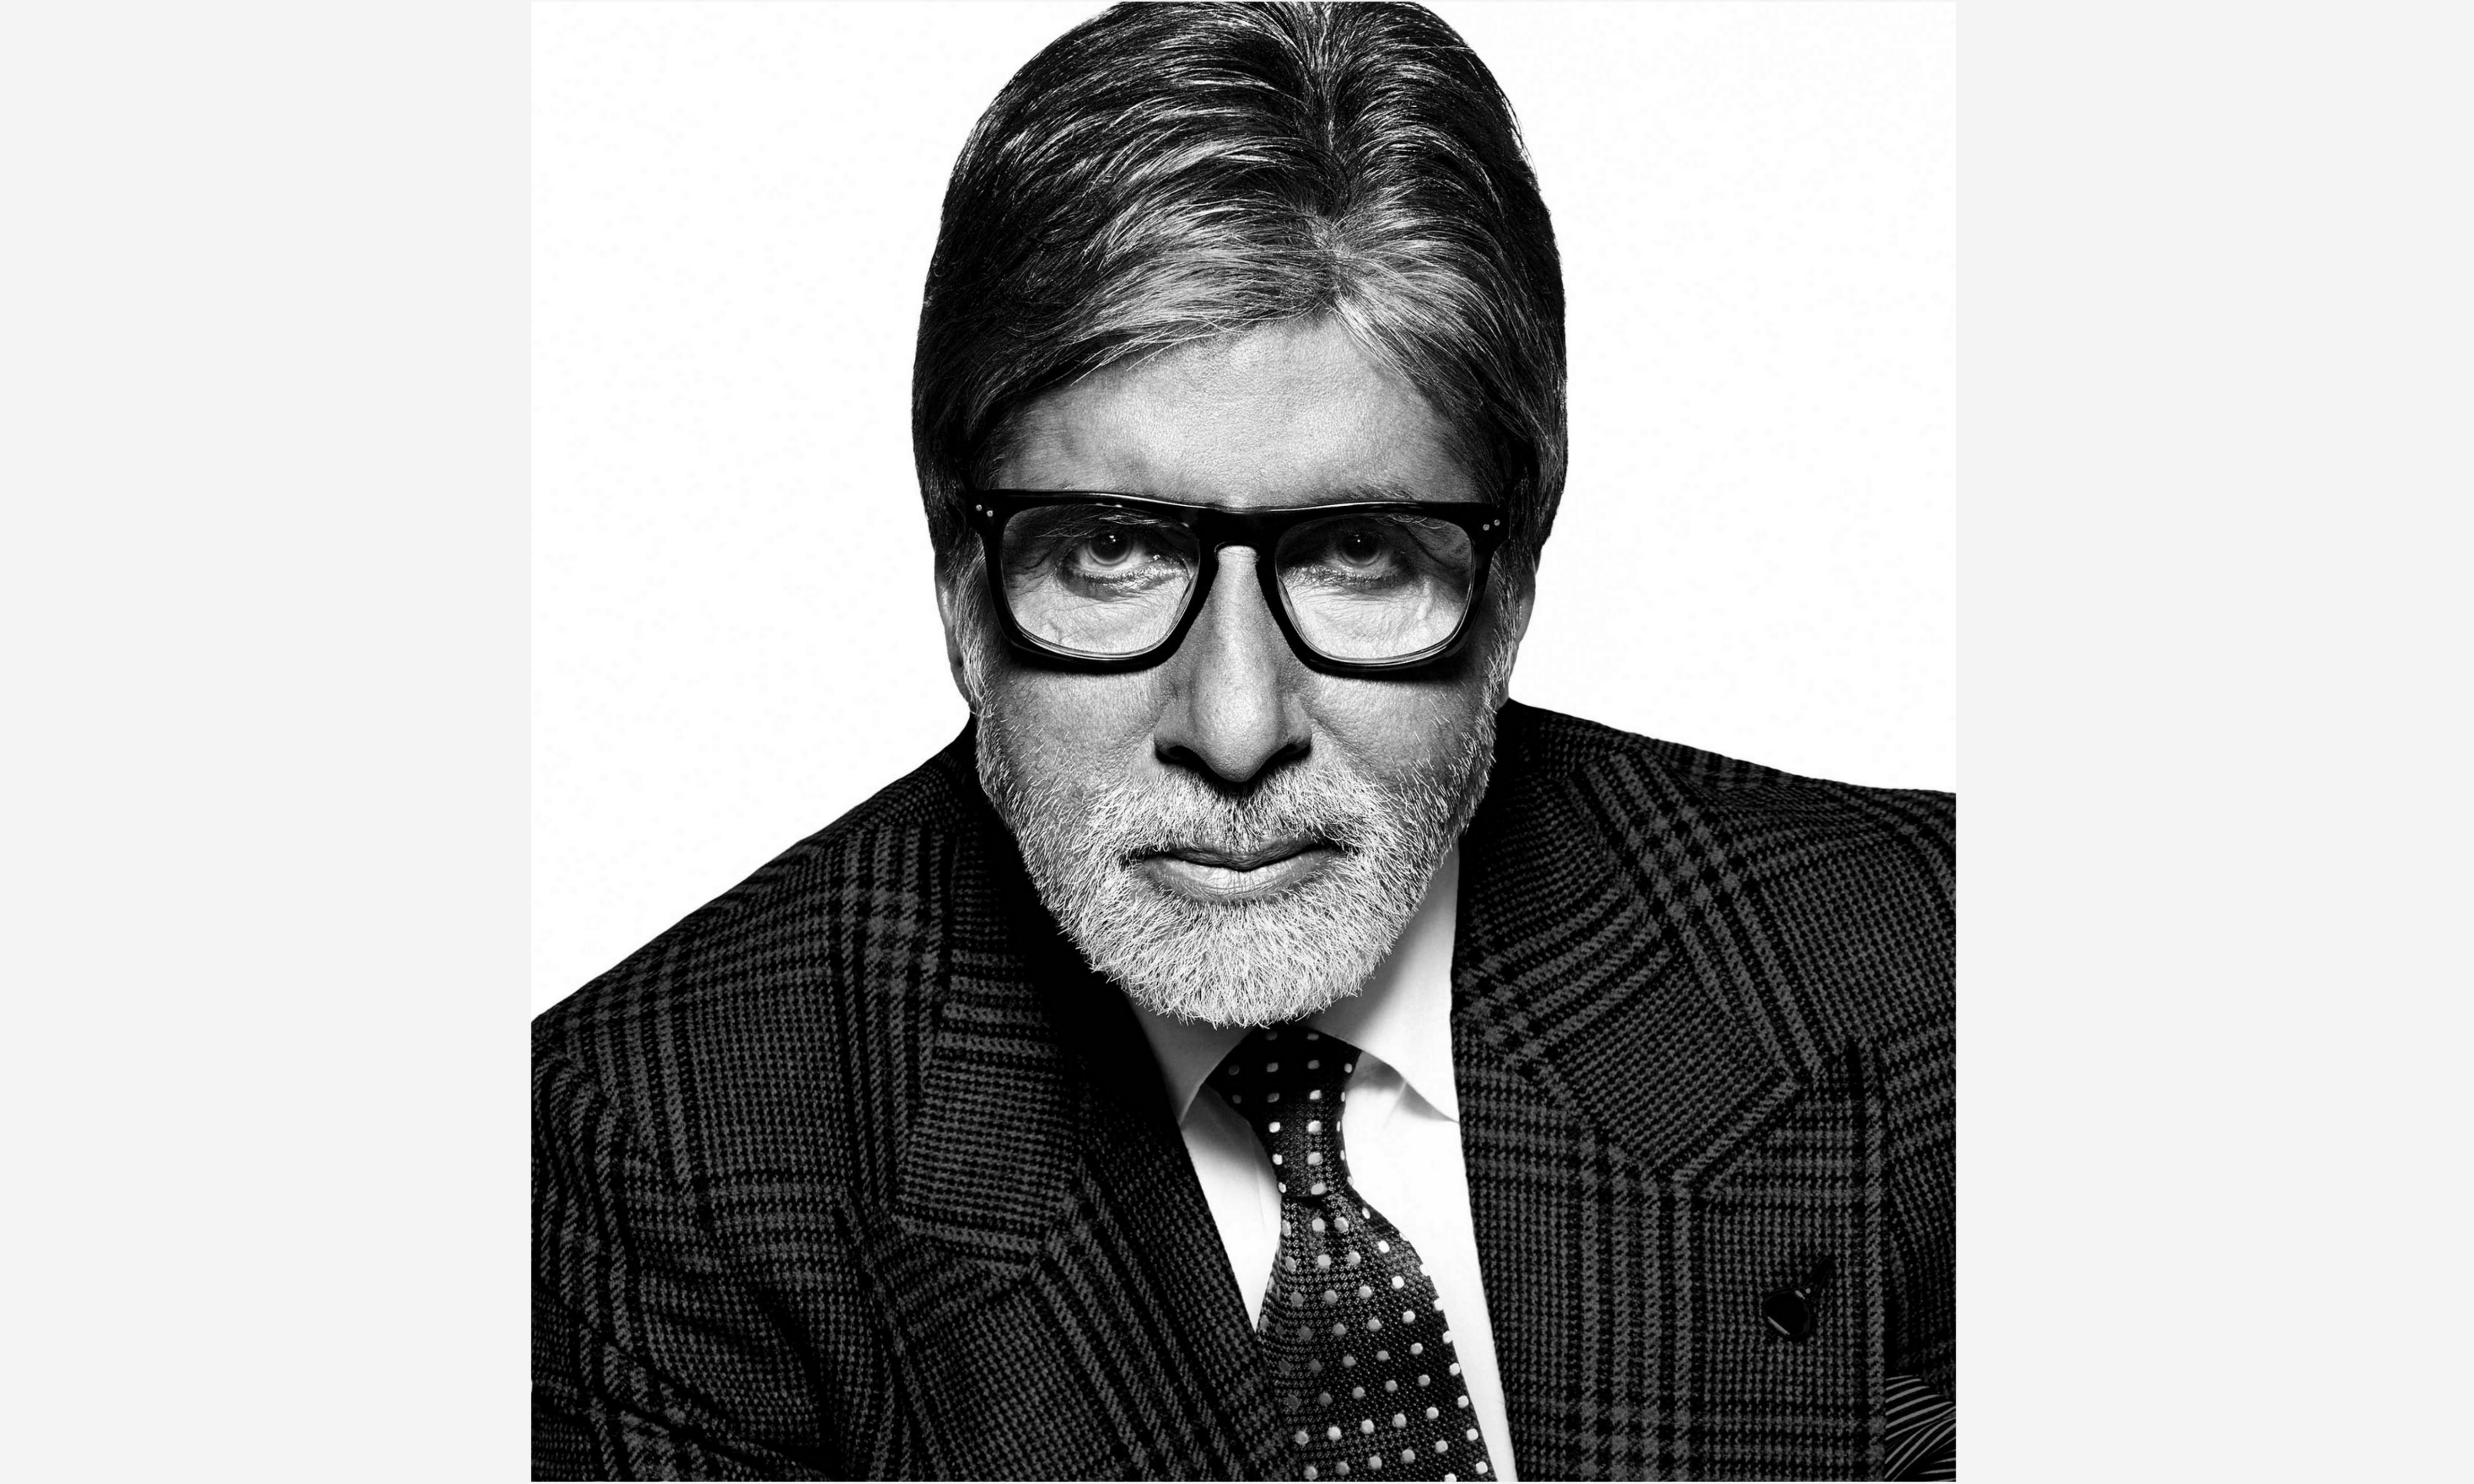 Kaun Banega Crorepati needs great attention: Amitabh Bachchan!